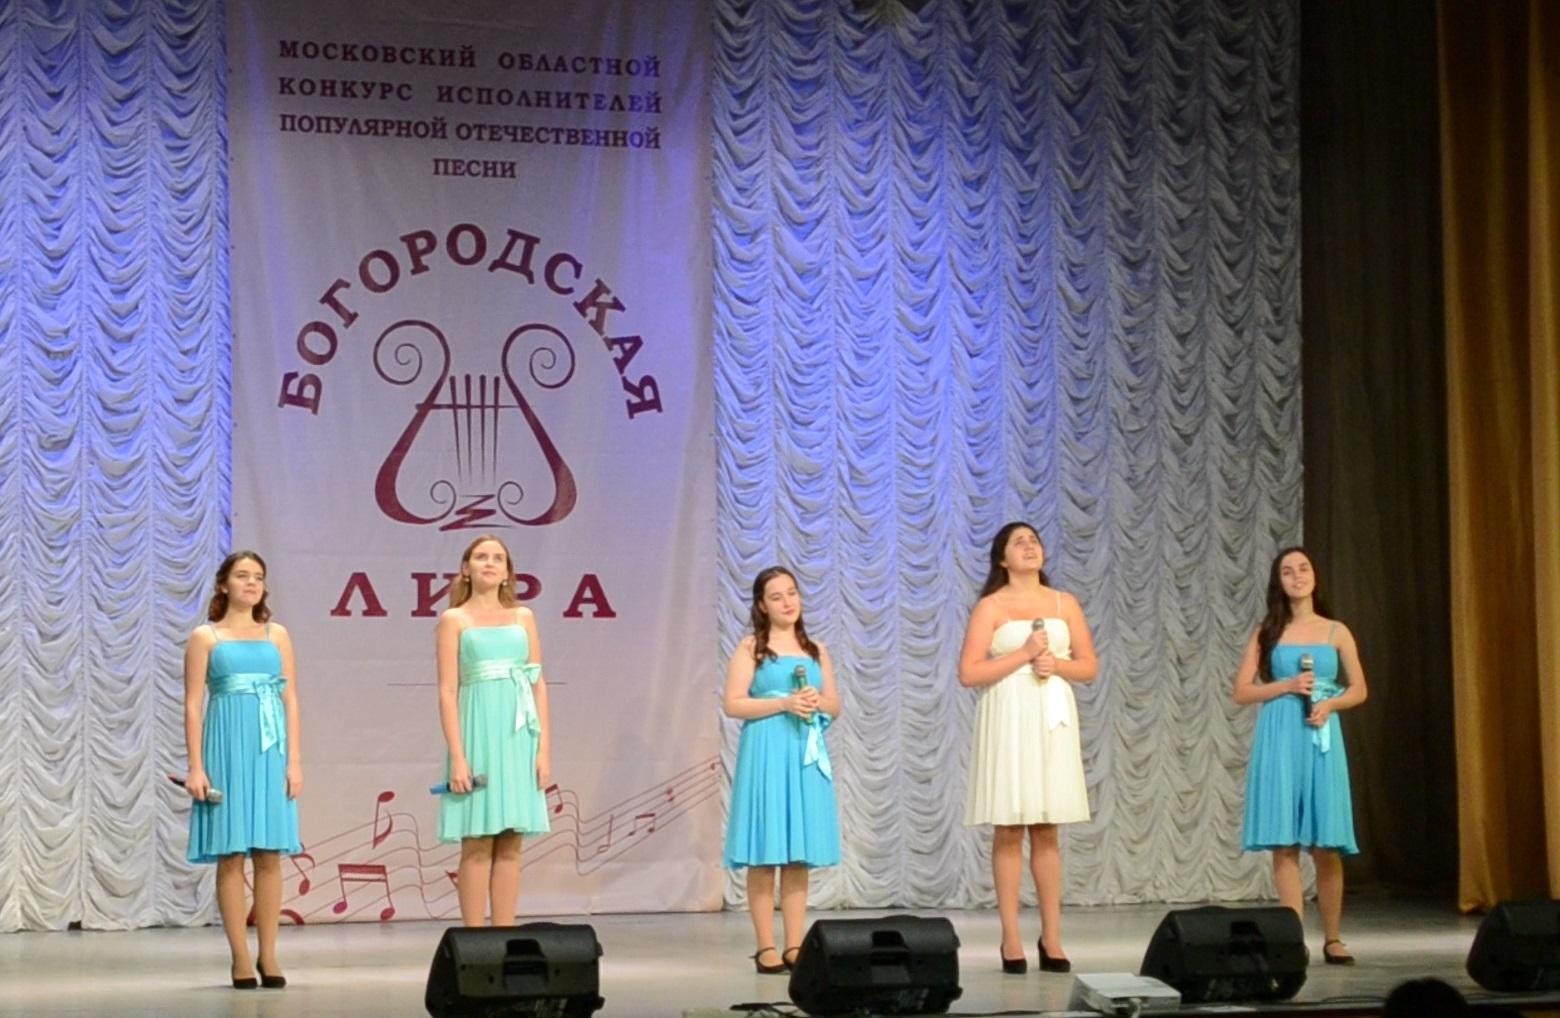 Богородск конкурс